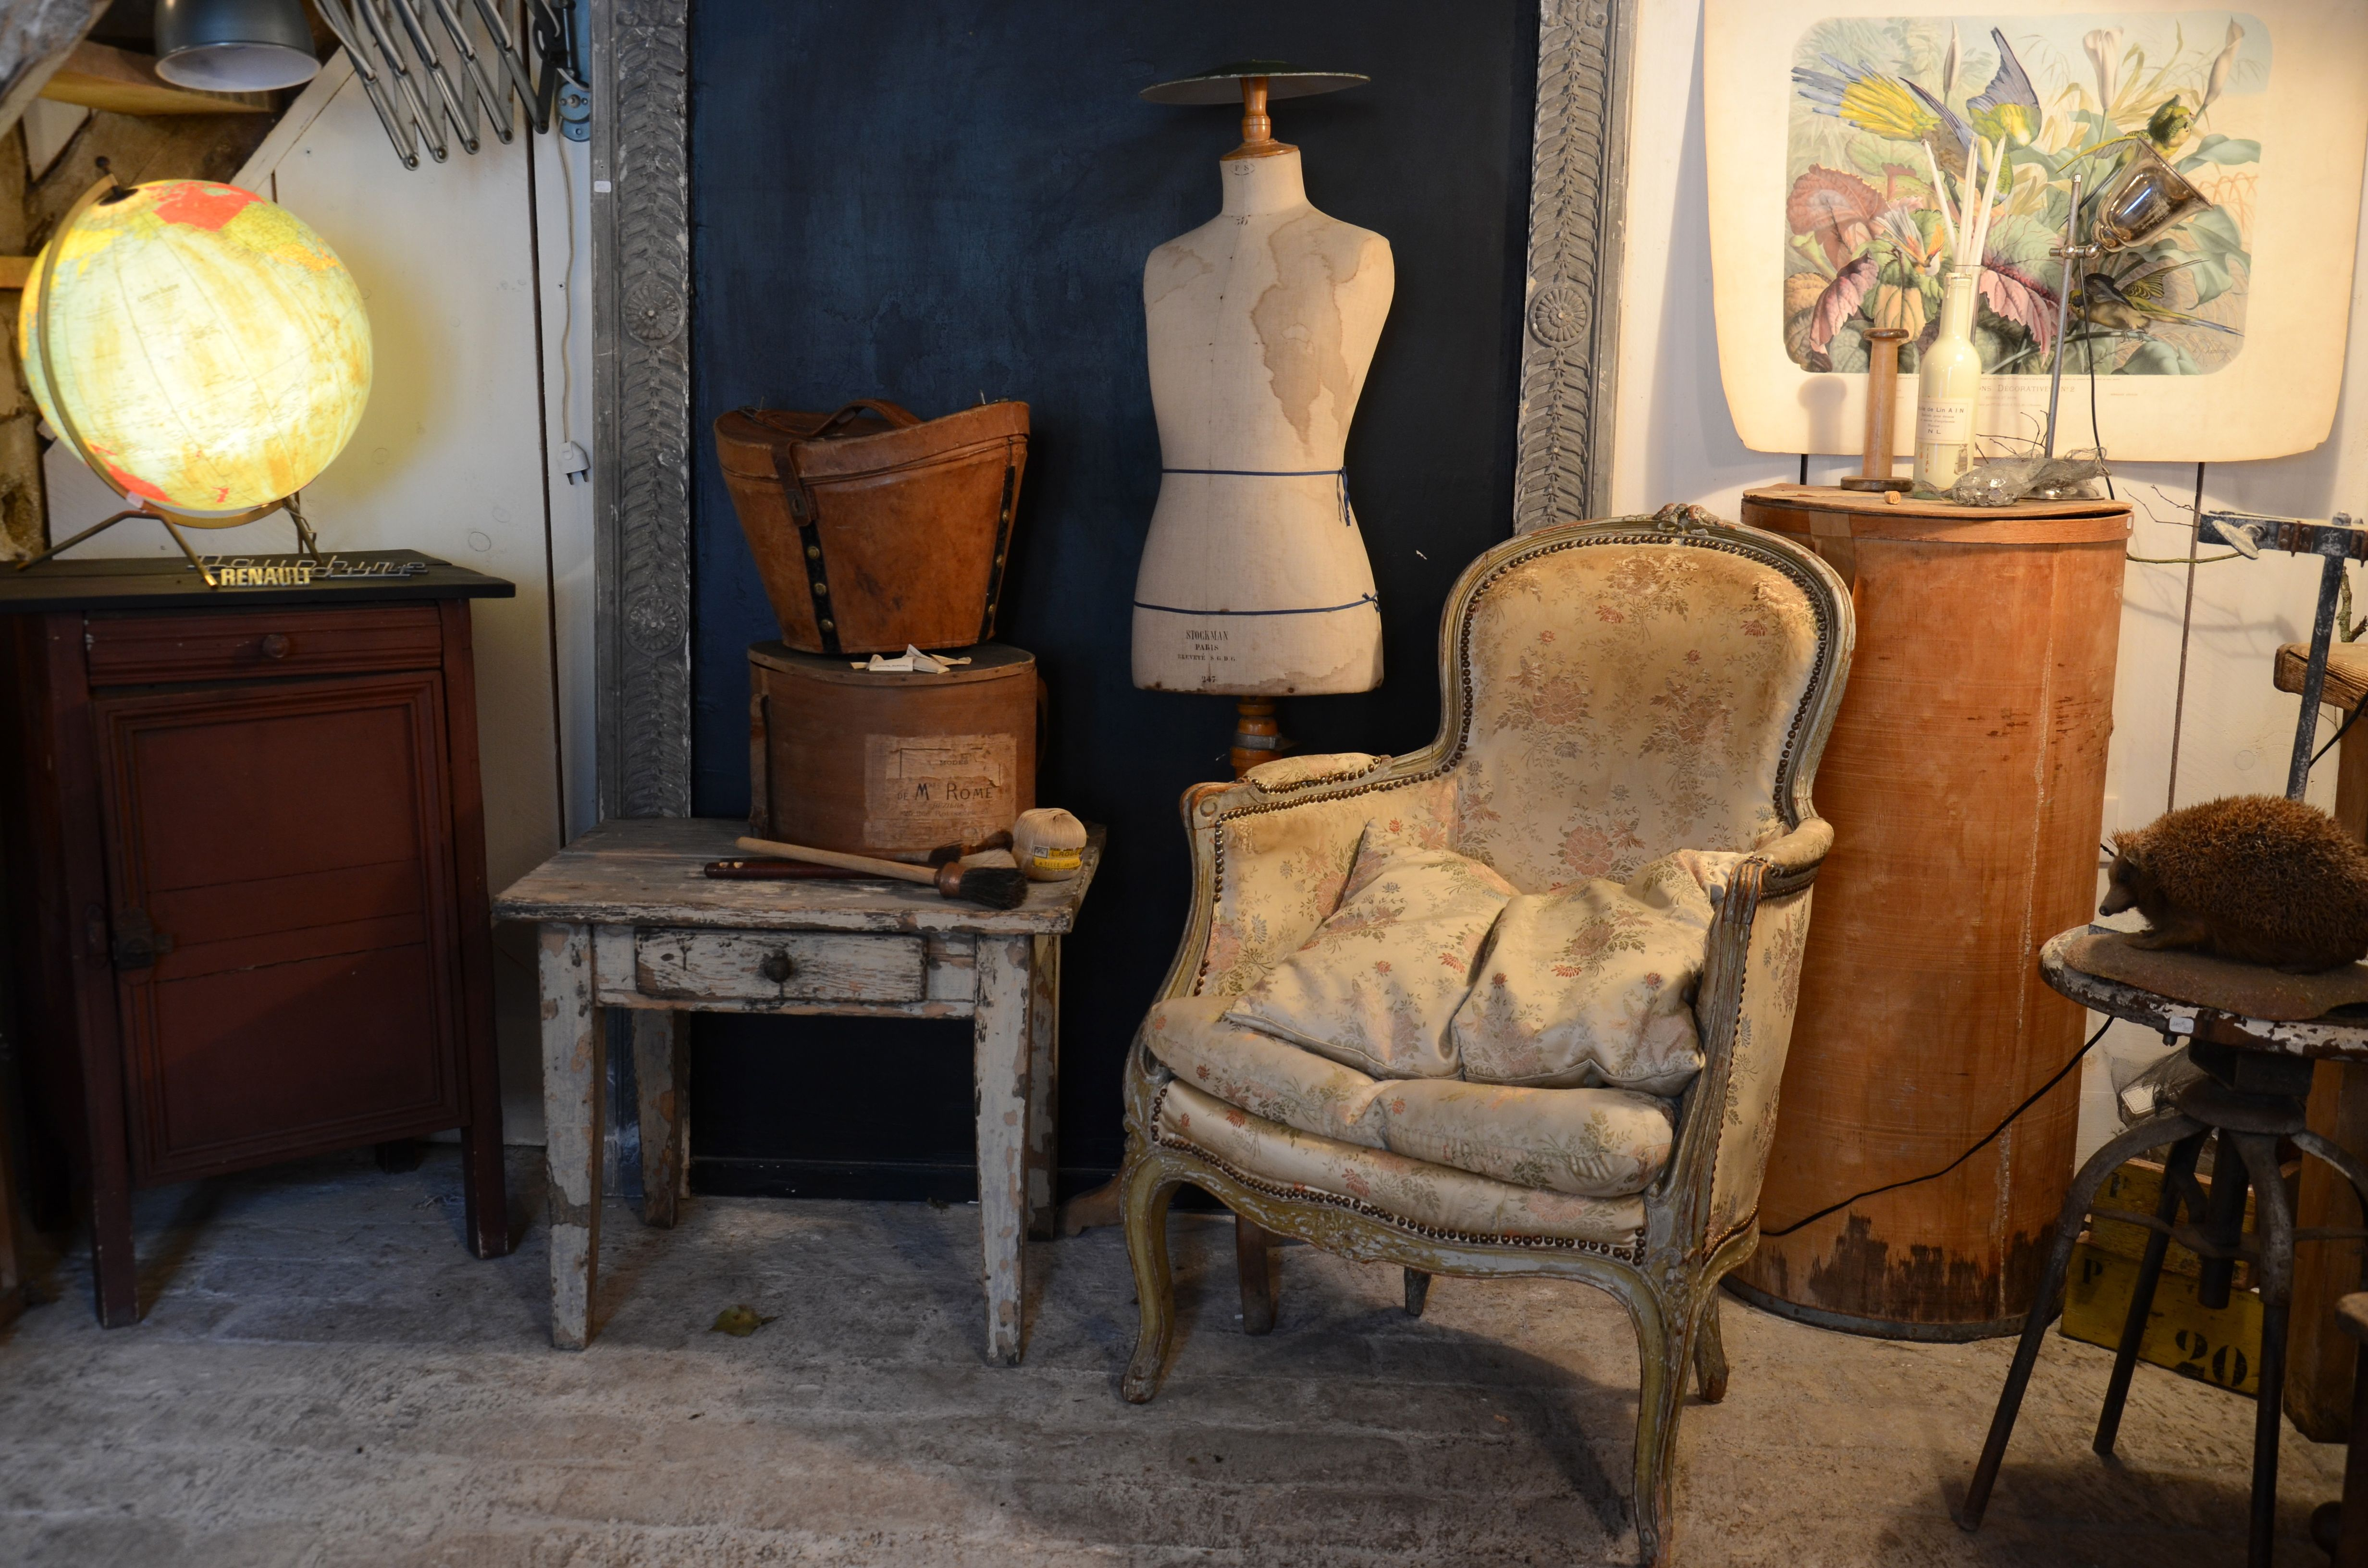 brocante de la bruyere my nest pinterest nest and interiors. Black Bedroom Furniture Sets. Home Design Ideas